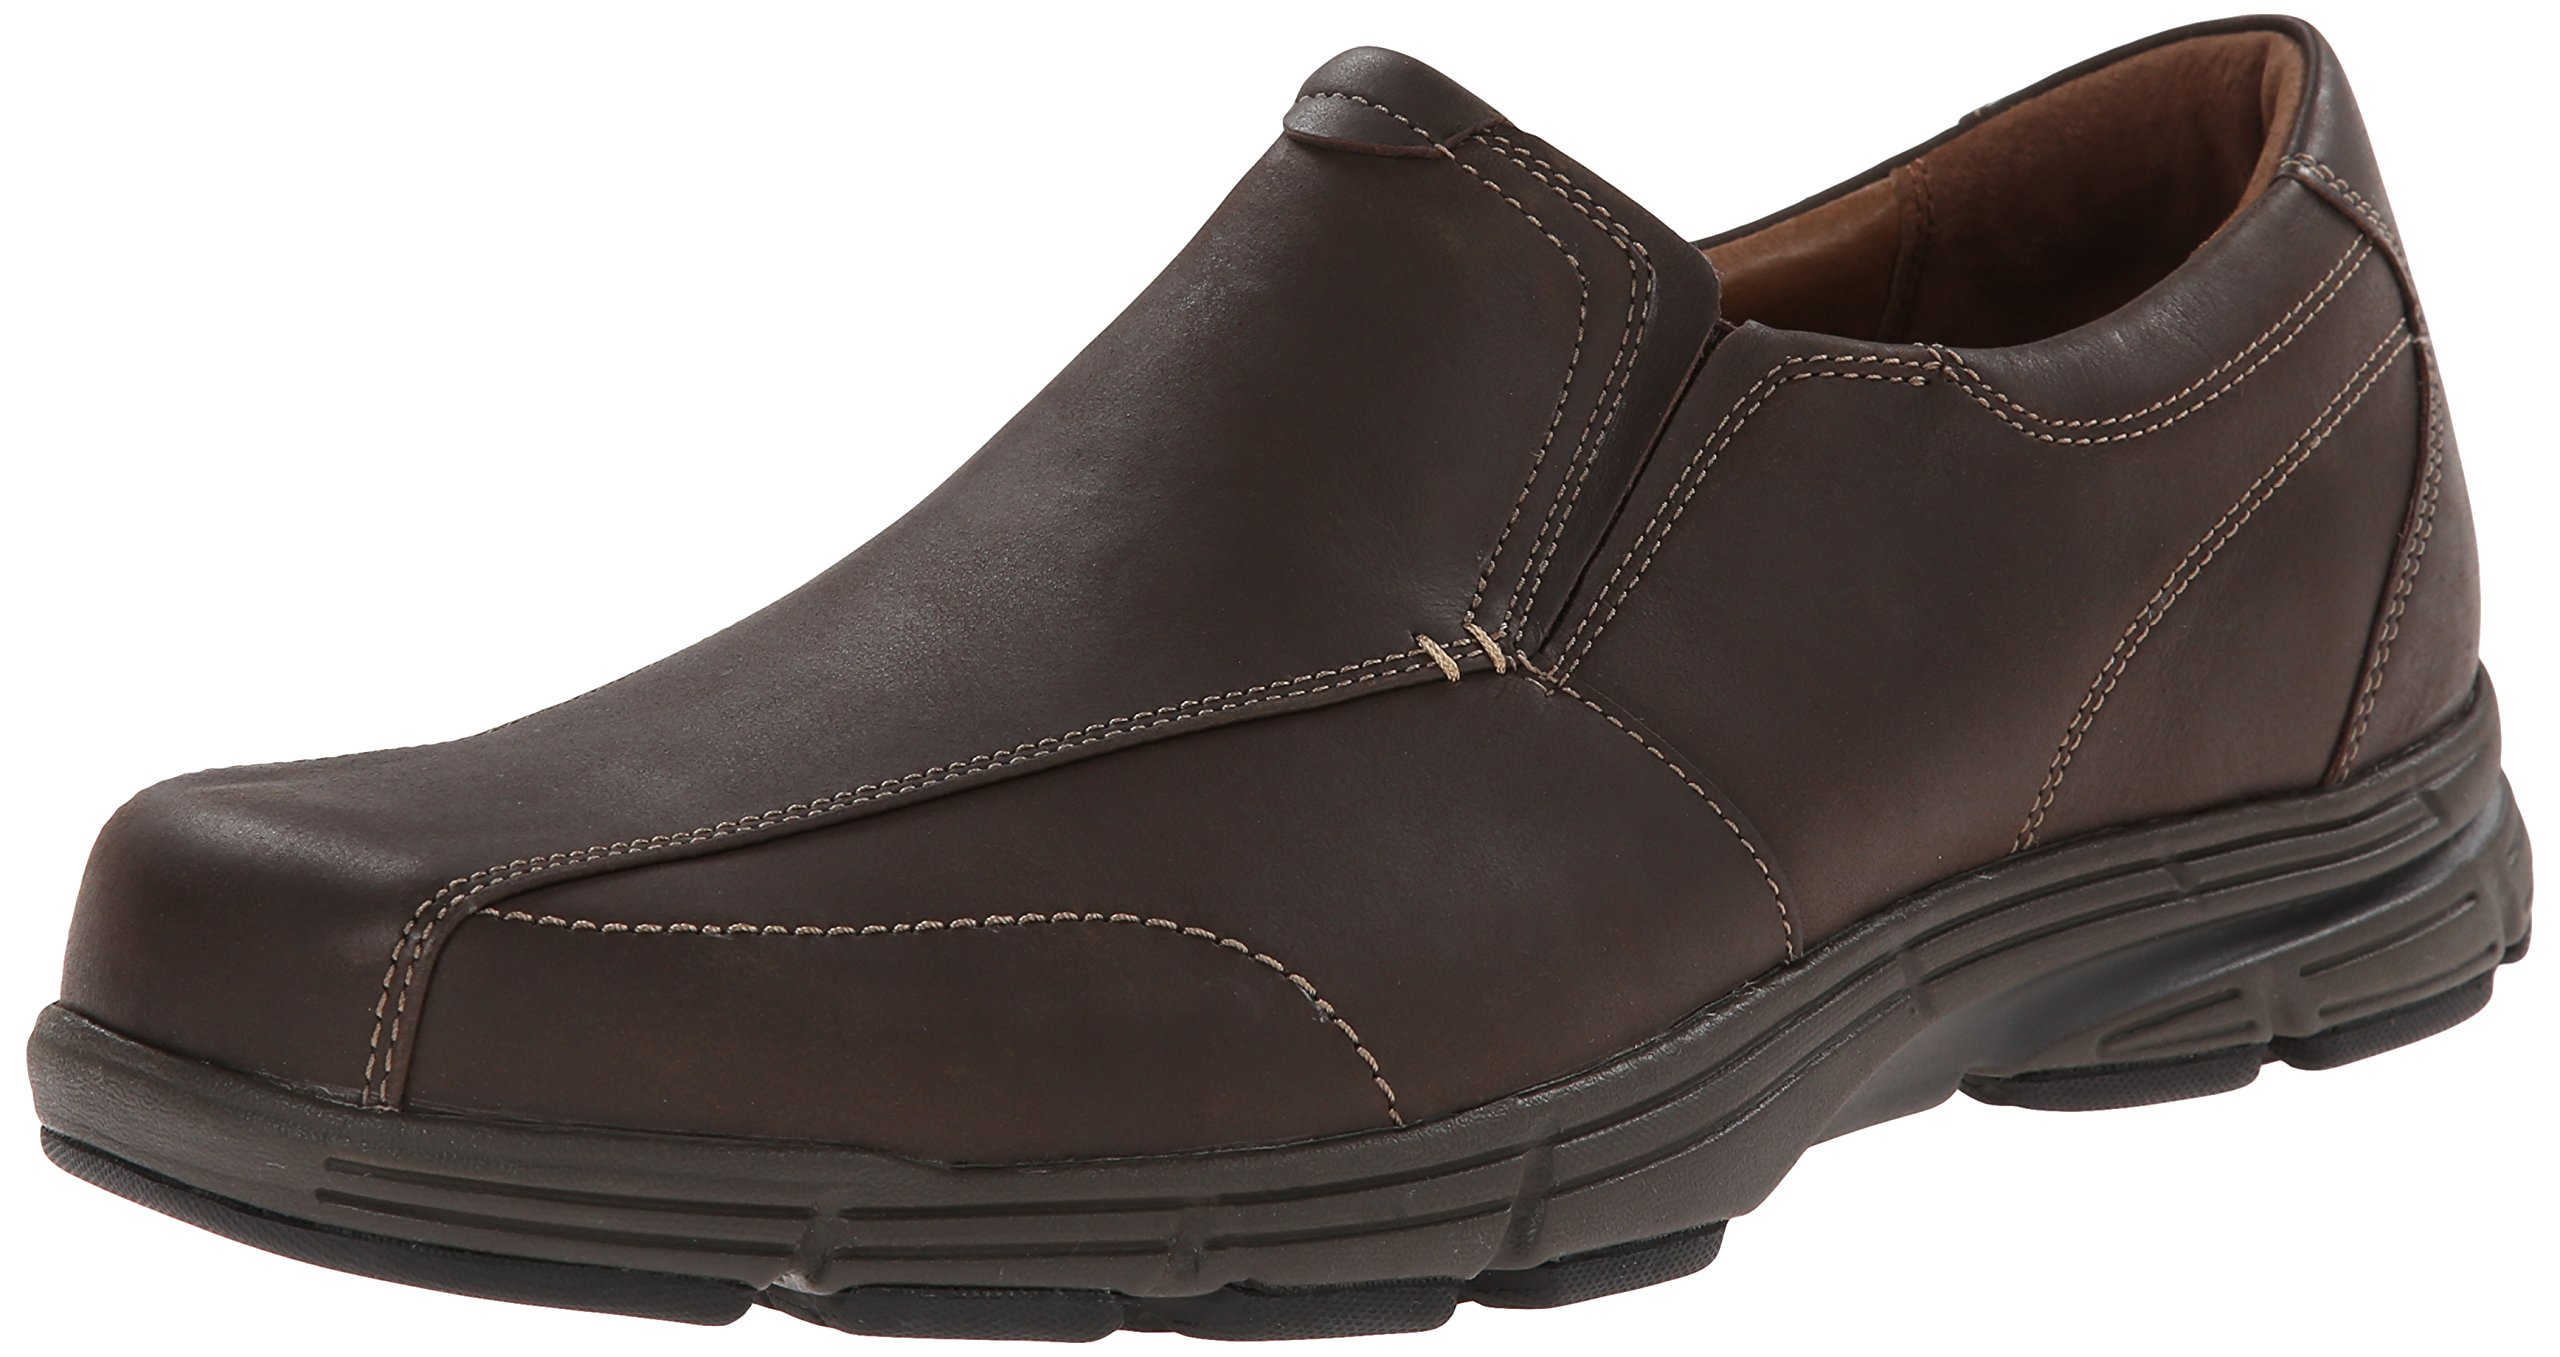 Dunham Men's Revsaber Loafers